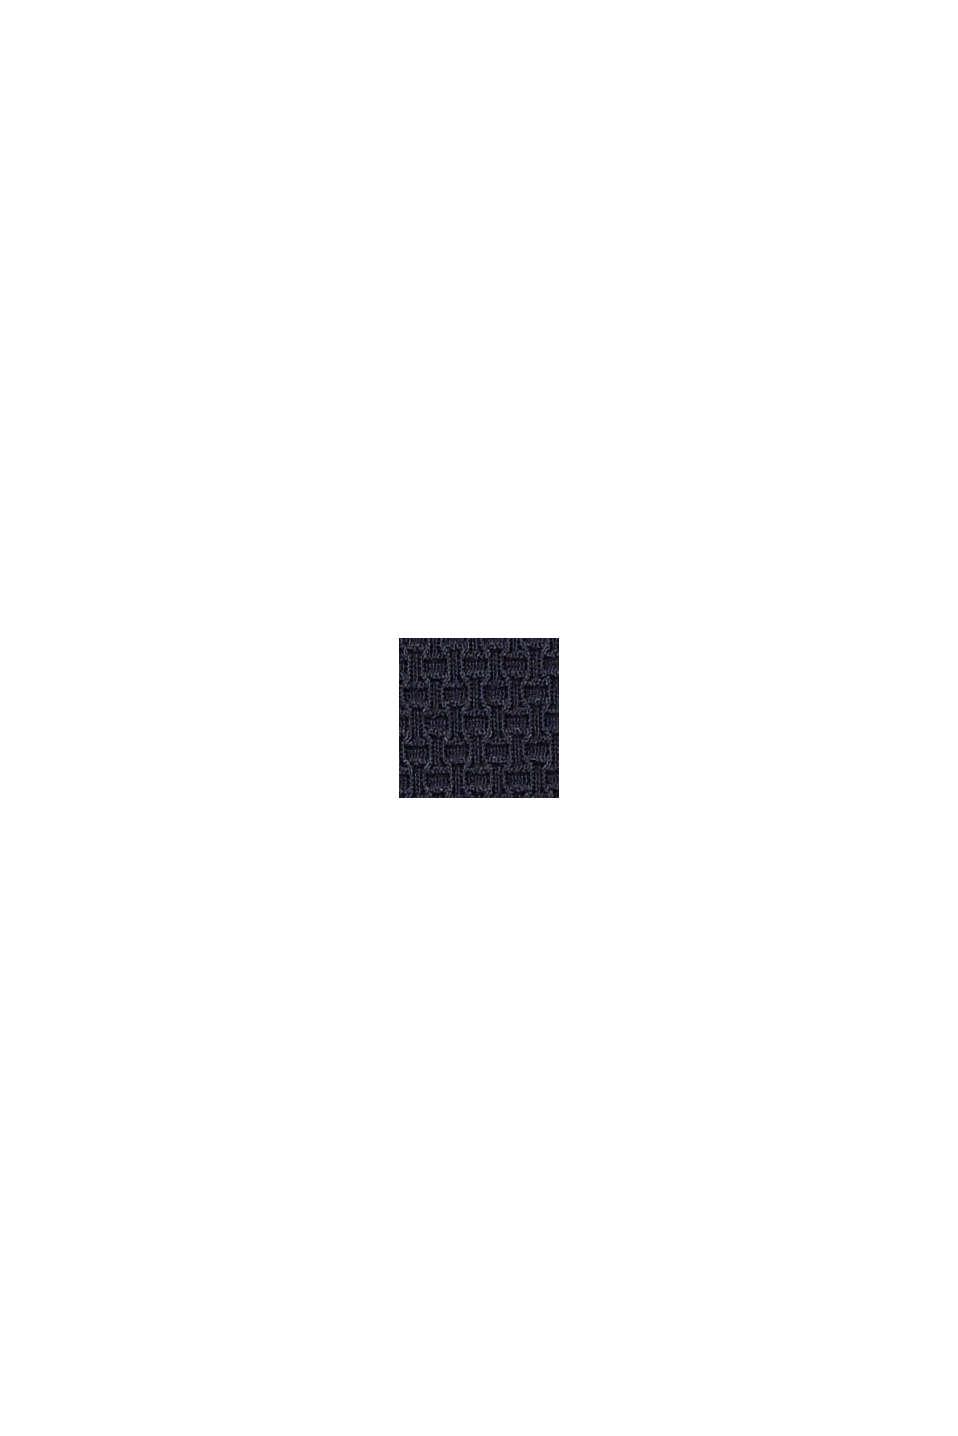 Highwaist-trusse med struktur og bølgekant, NAVY, swatch